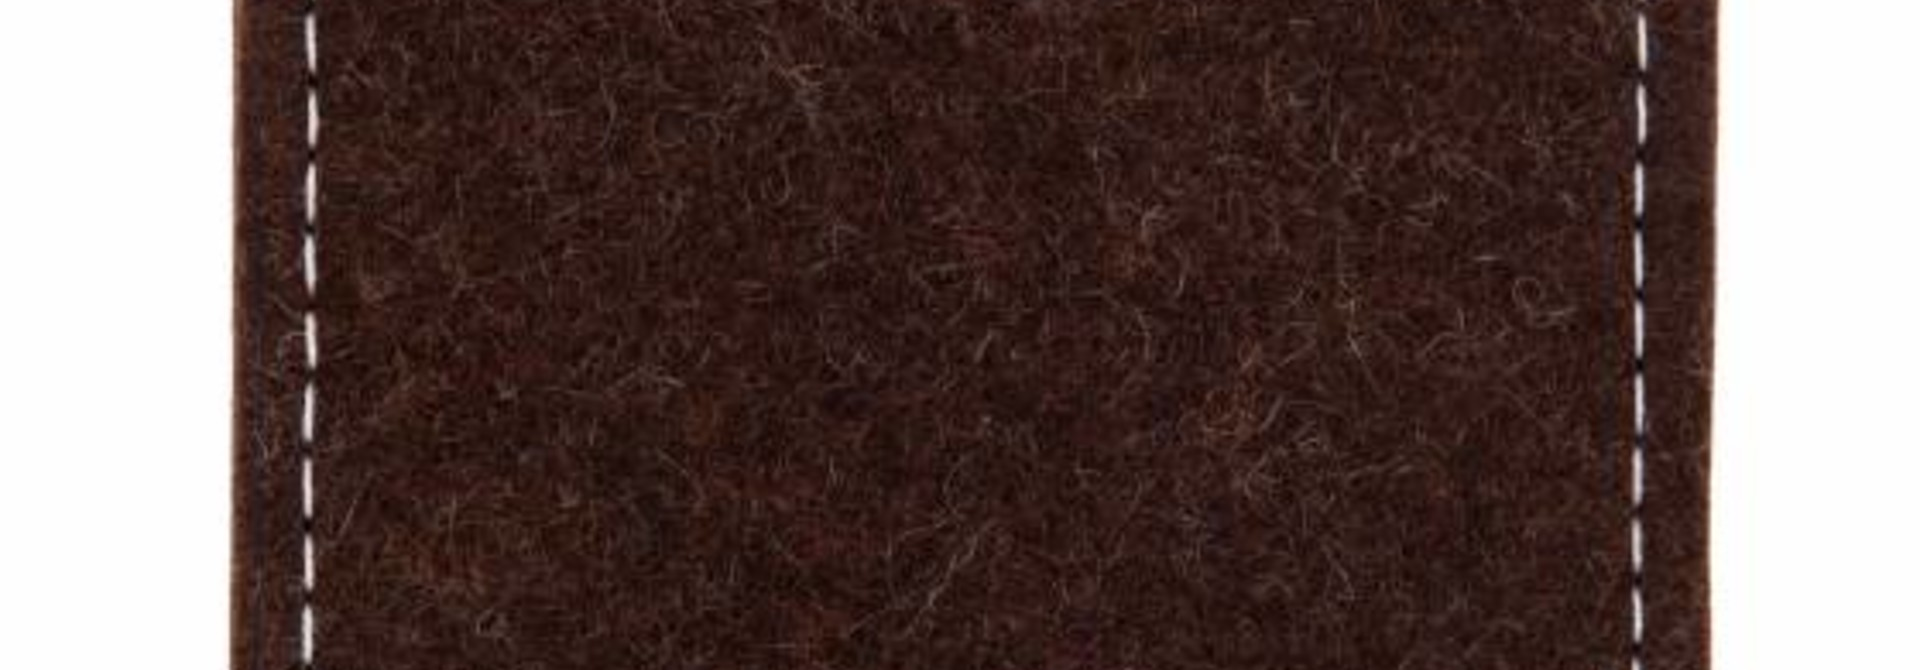 Lumia Sleeve Truffle-Brown